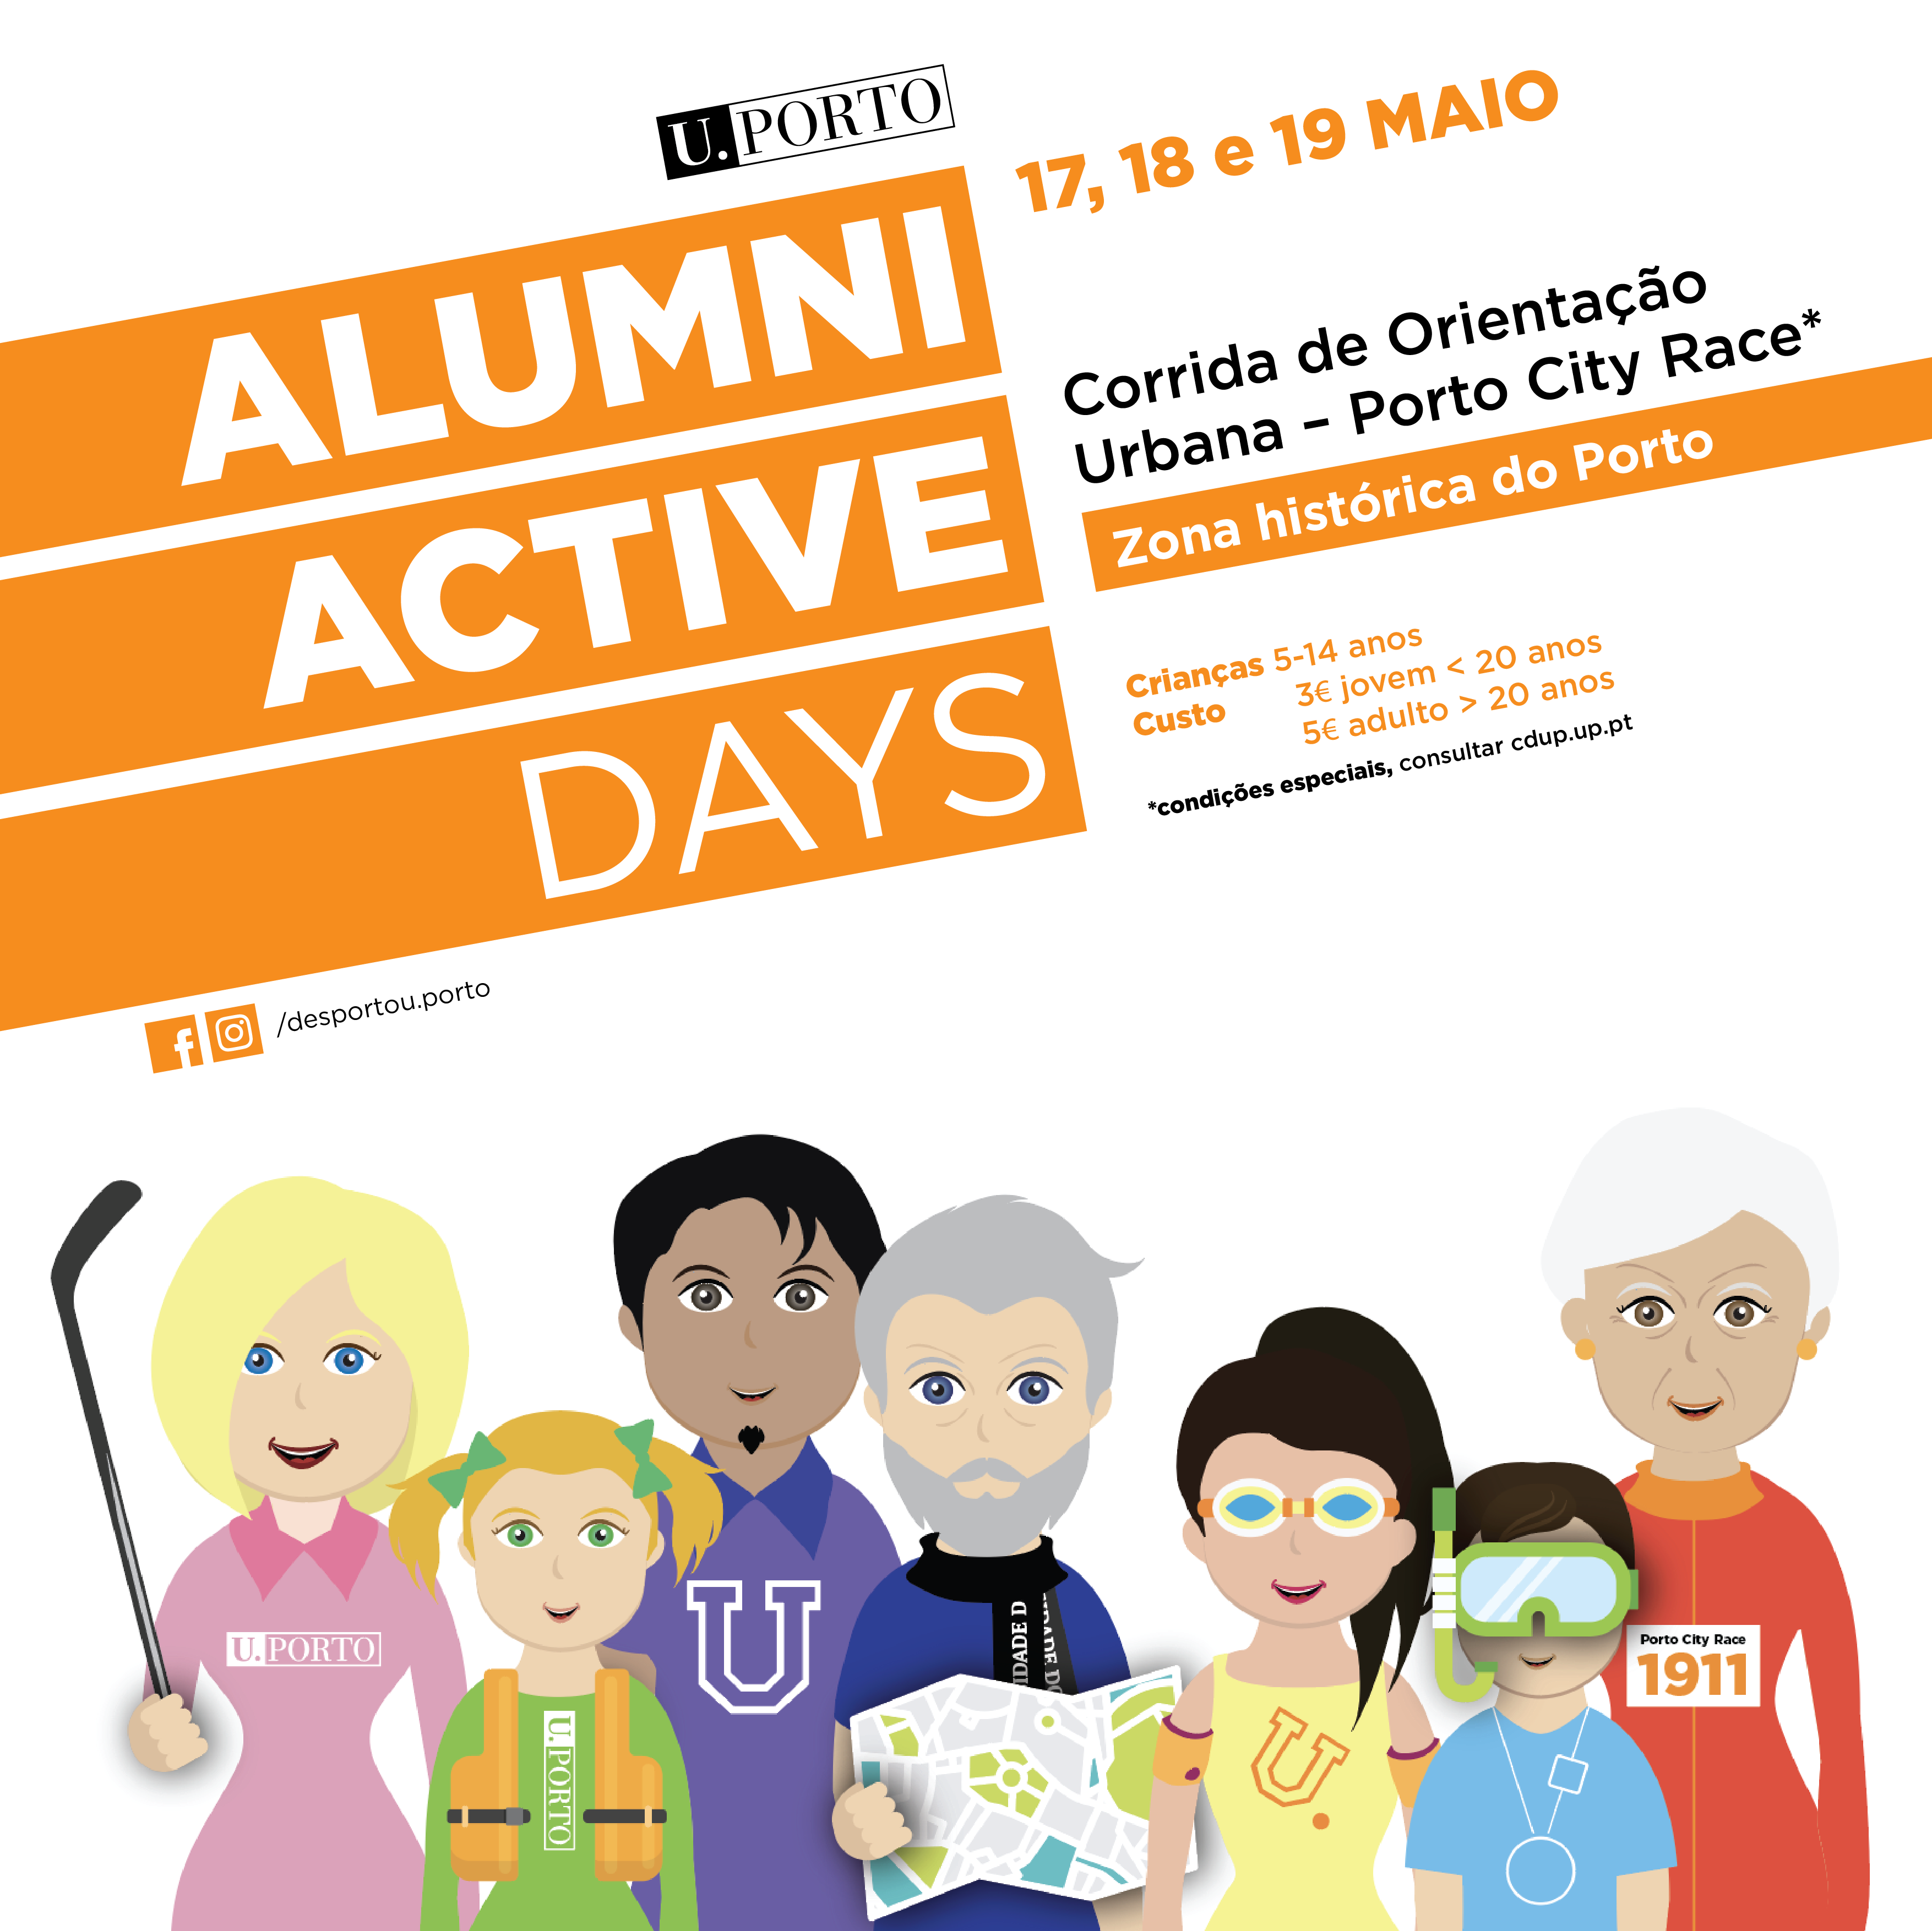 Alumni Active Days maio 2019